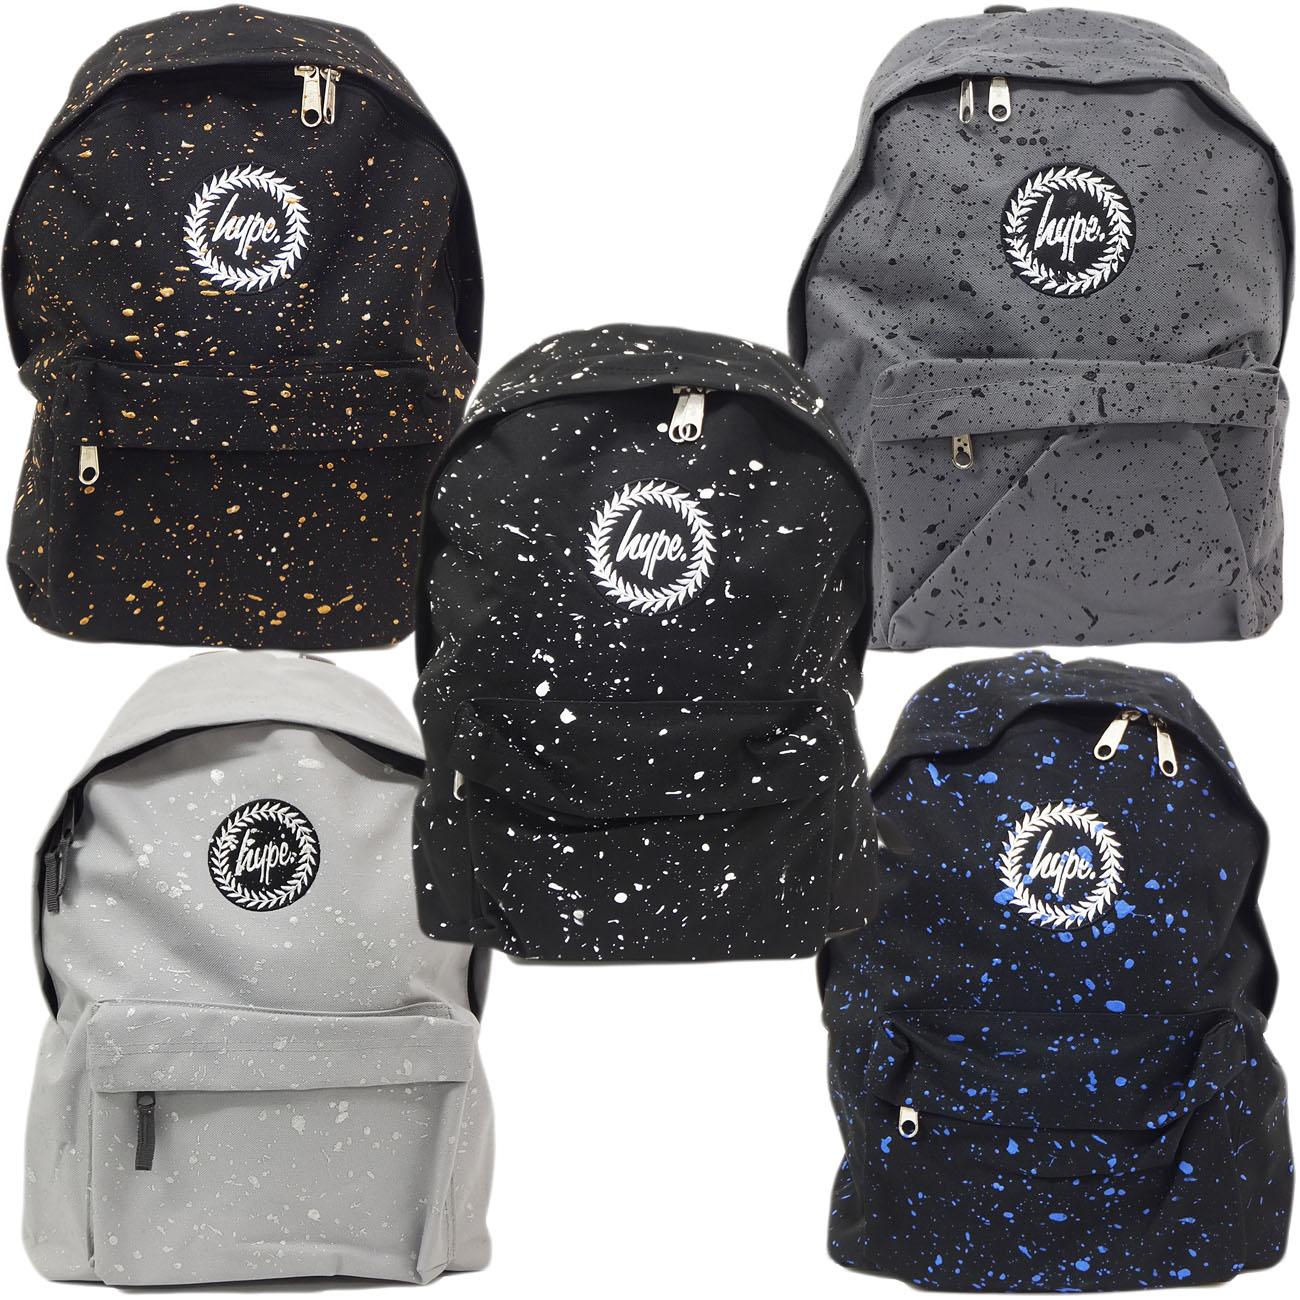 Sentinel Just Hype Backpack Bag - Paint Splash Design f32aa244427e5